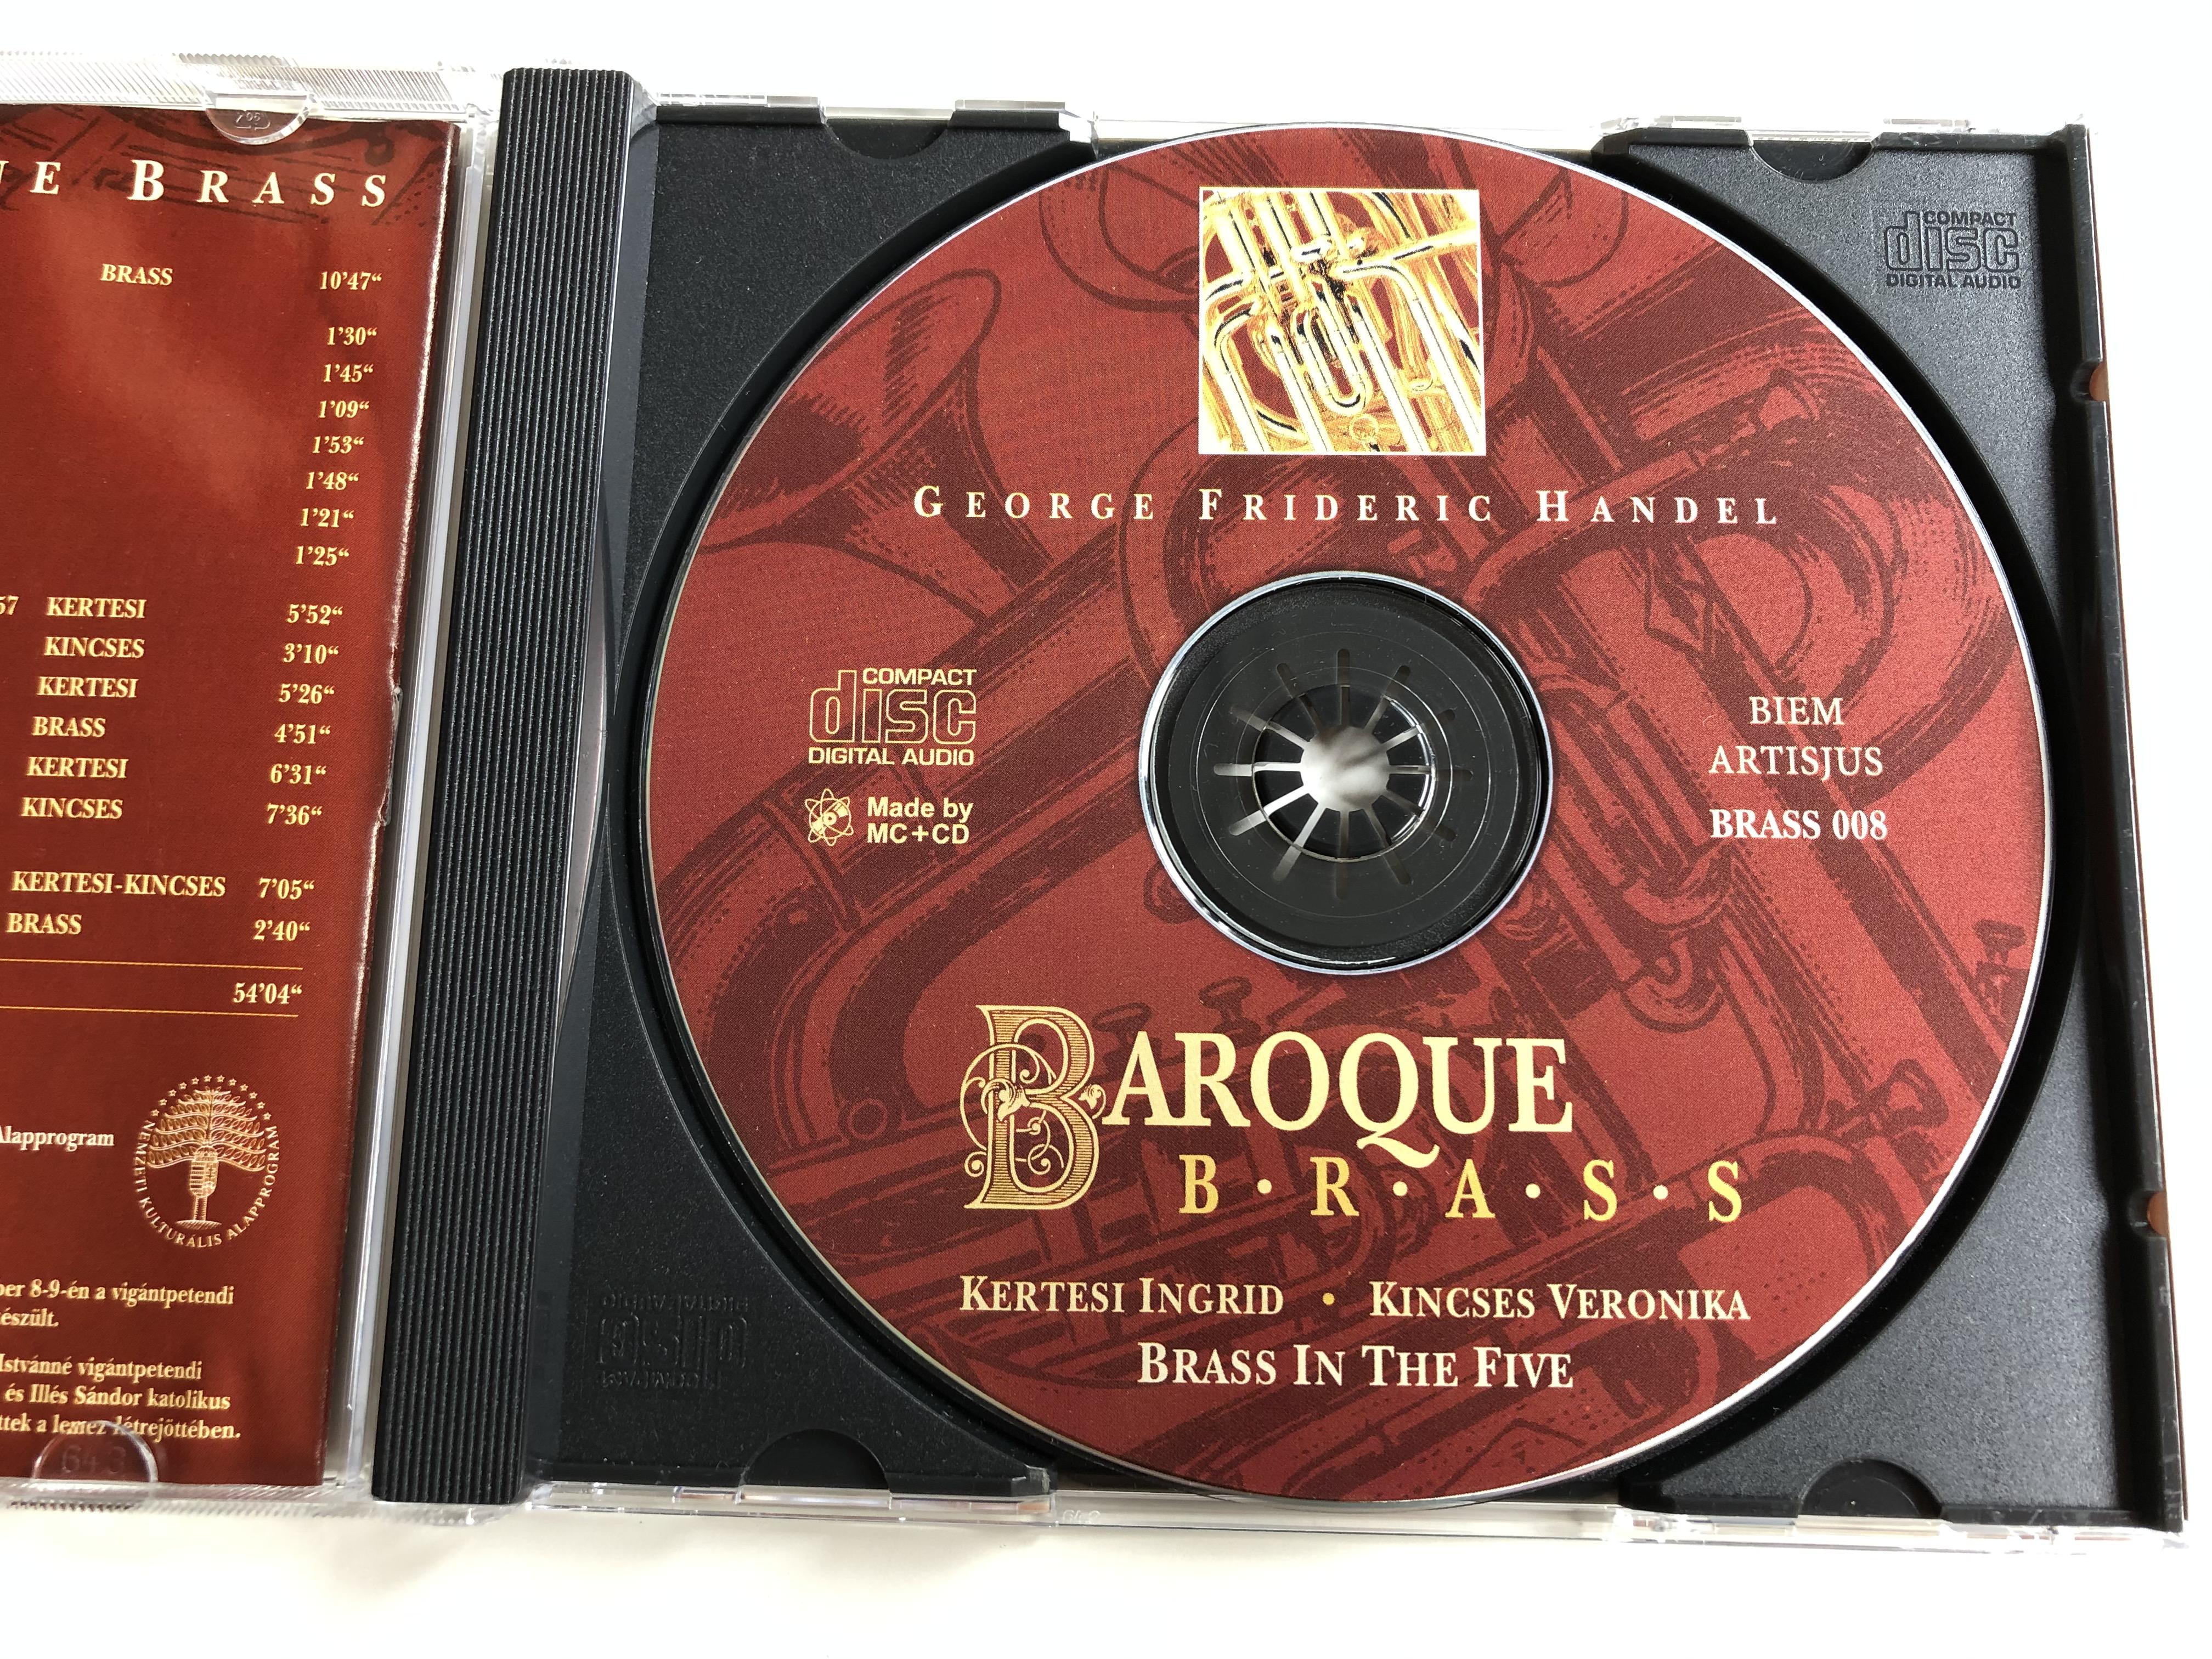 george-frideric-handel-baroque-brass-kertesi-ingrid-kincses-veronika-brass-in-the-five-brass-audio-cd-brass-008-8-.jpg